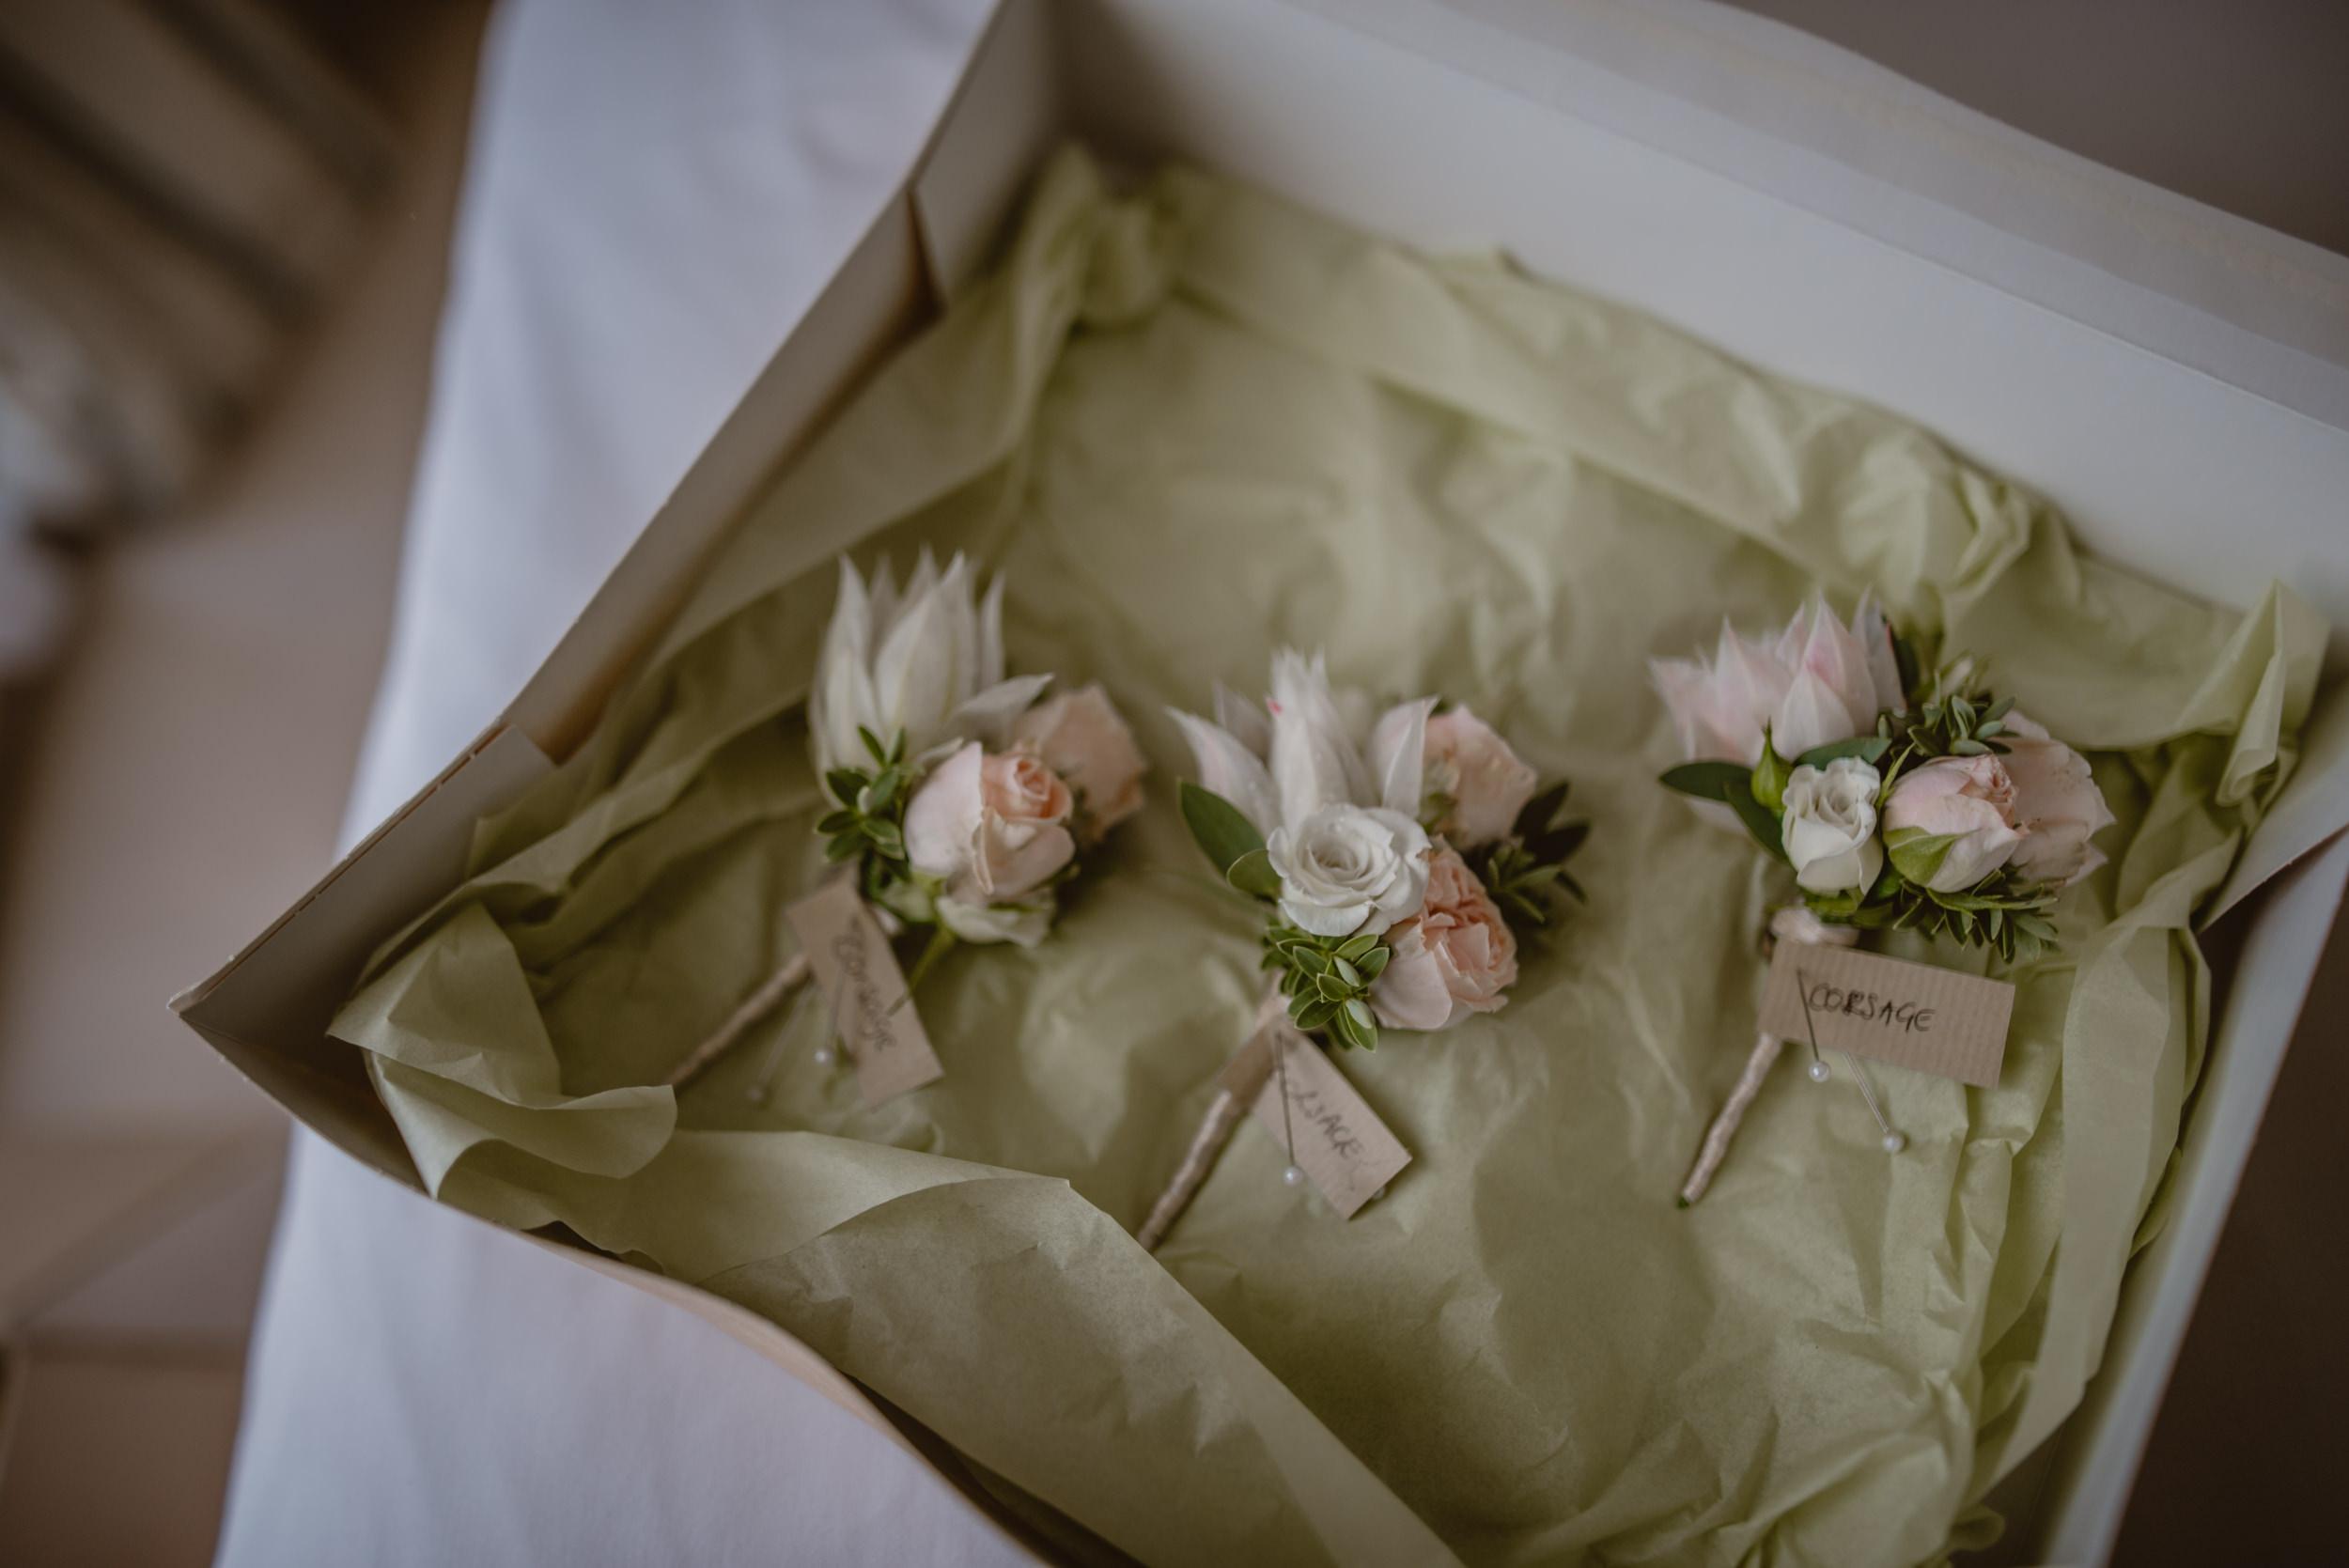 Trisha-and-Roger-wedding-The-Priory-Church-and-Chewton-Glen-Hotel-Christchurch-Manu-Mendoza-Wedding-Photography-008.jpg